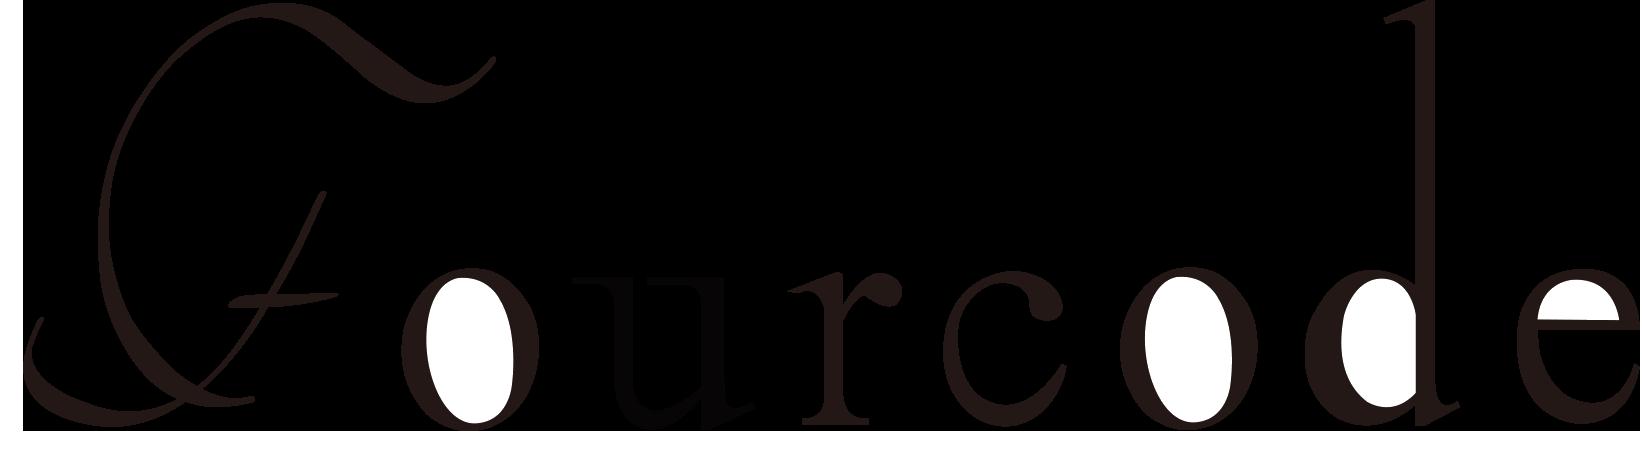 fourcode